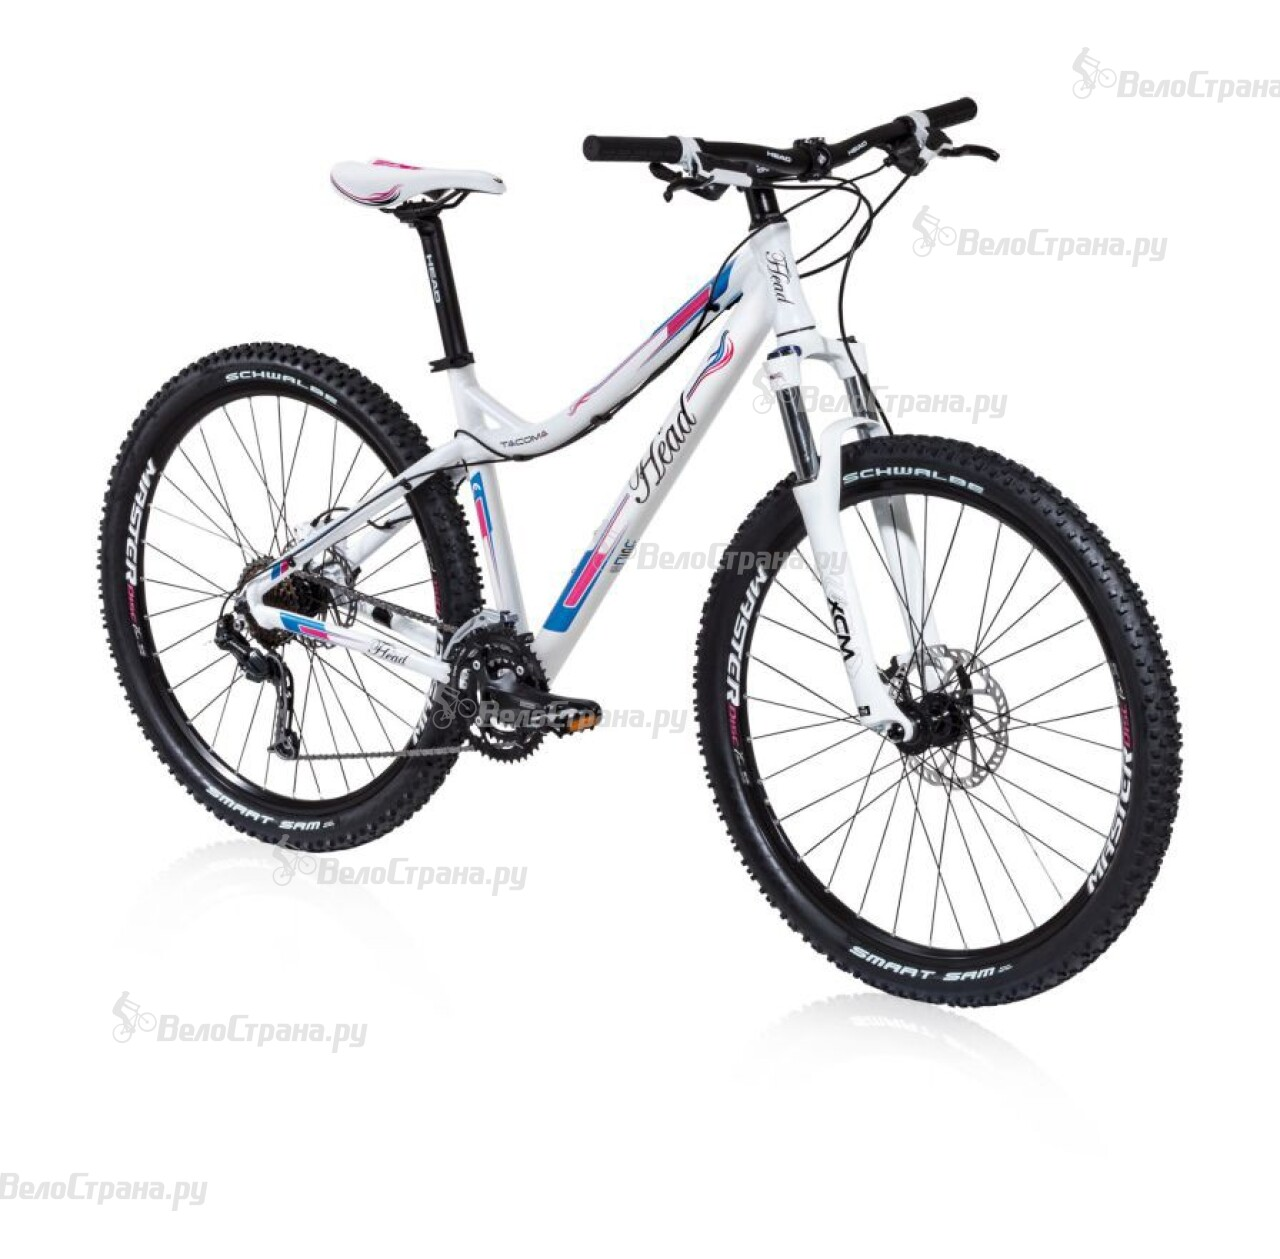 Велосипед Head Tacoma 27,5 (2014)